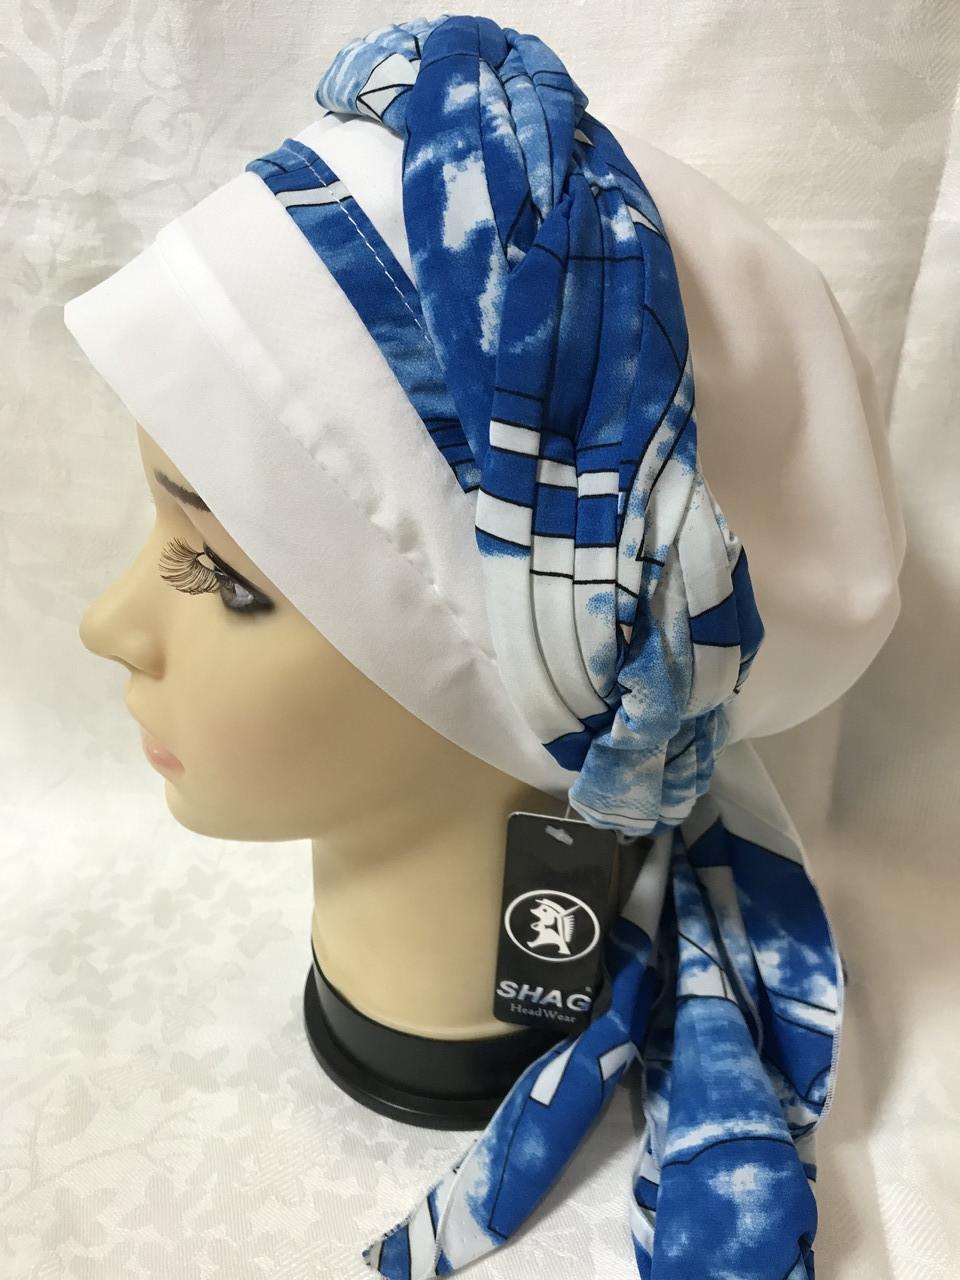 Женская летняя  бандана-шапка-косынка белая с синим и бирюзовая